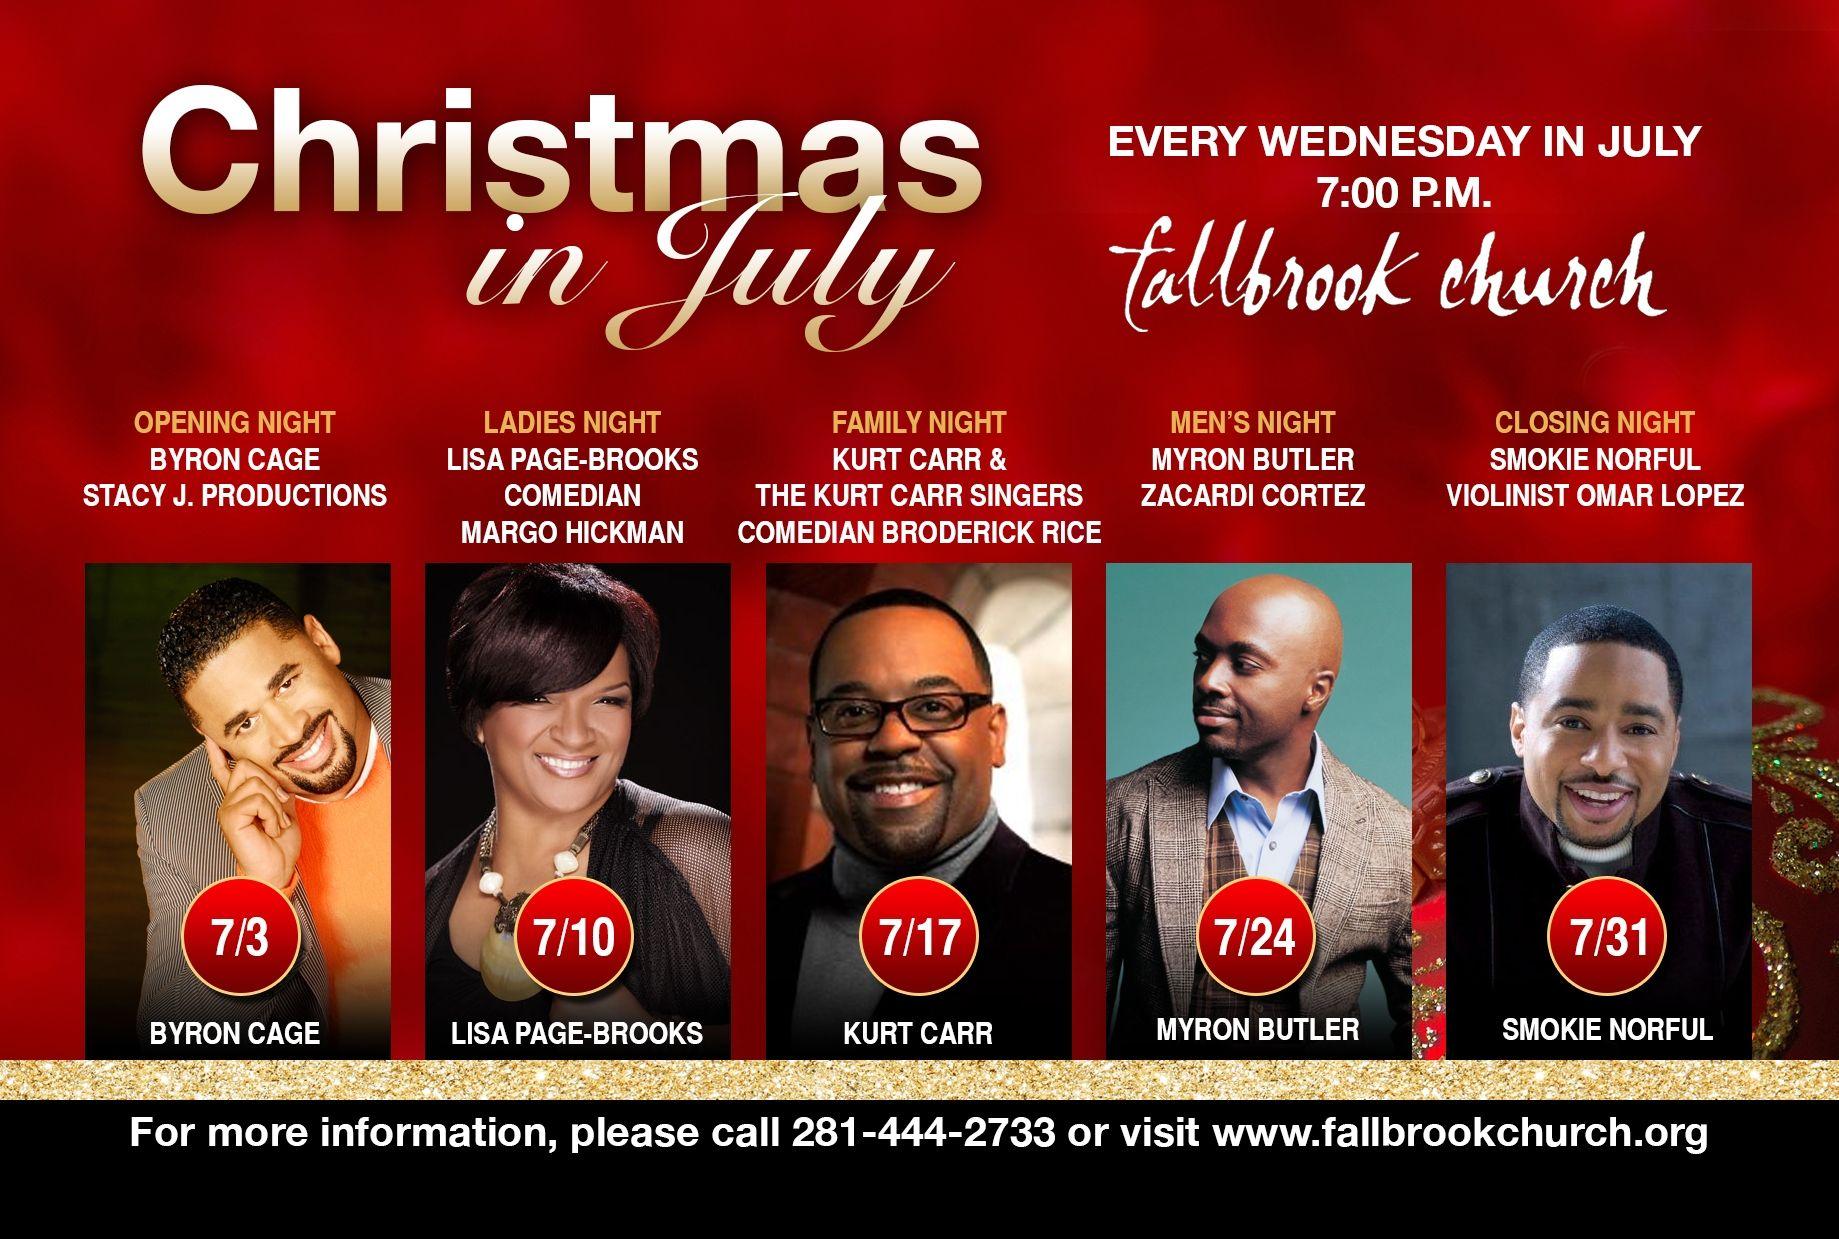 Fallbrook Church Christmas In July 2020 Fallbrook Church | | Family night, Church, Empowerment